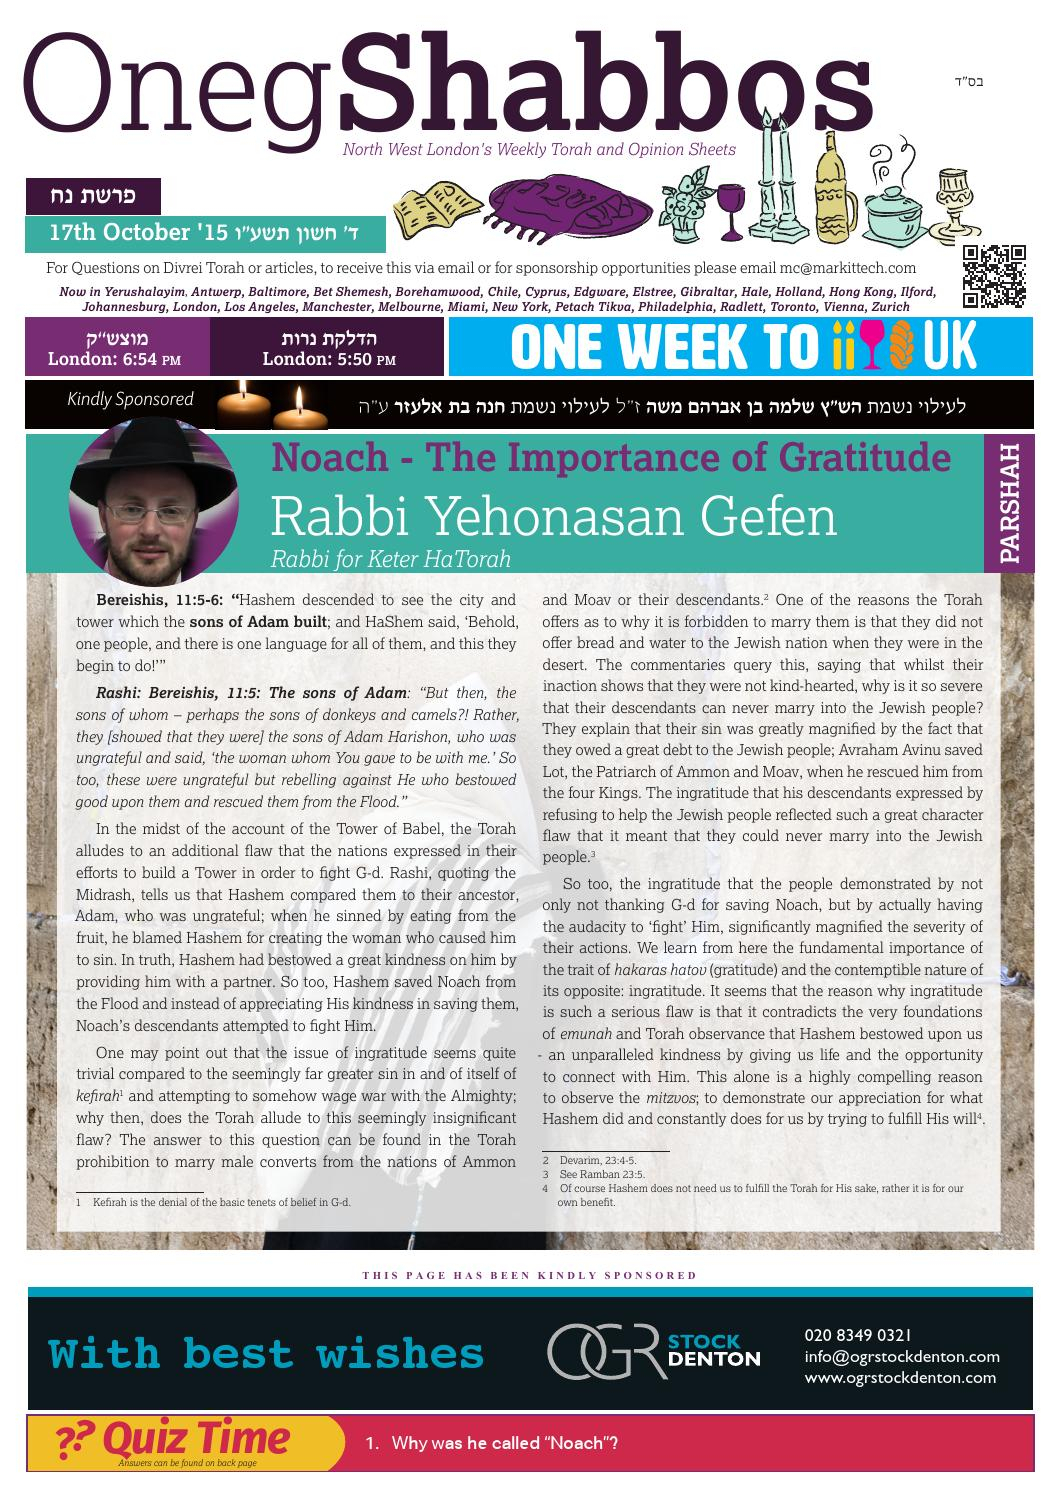 Tehillim Spreadsheet Pertaining To Oneg Noachoneg Shabbos  Issuu